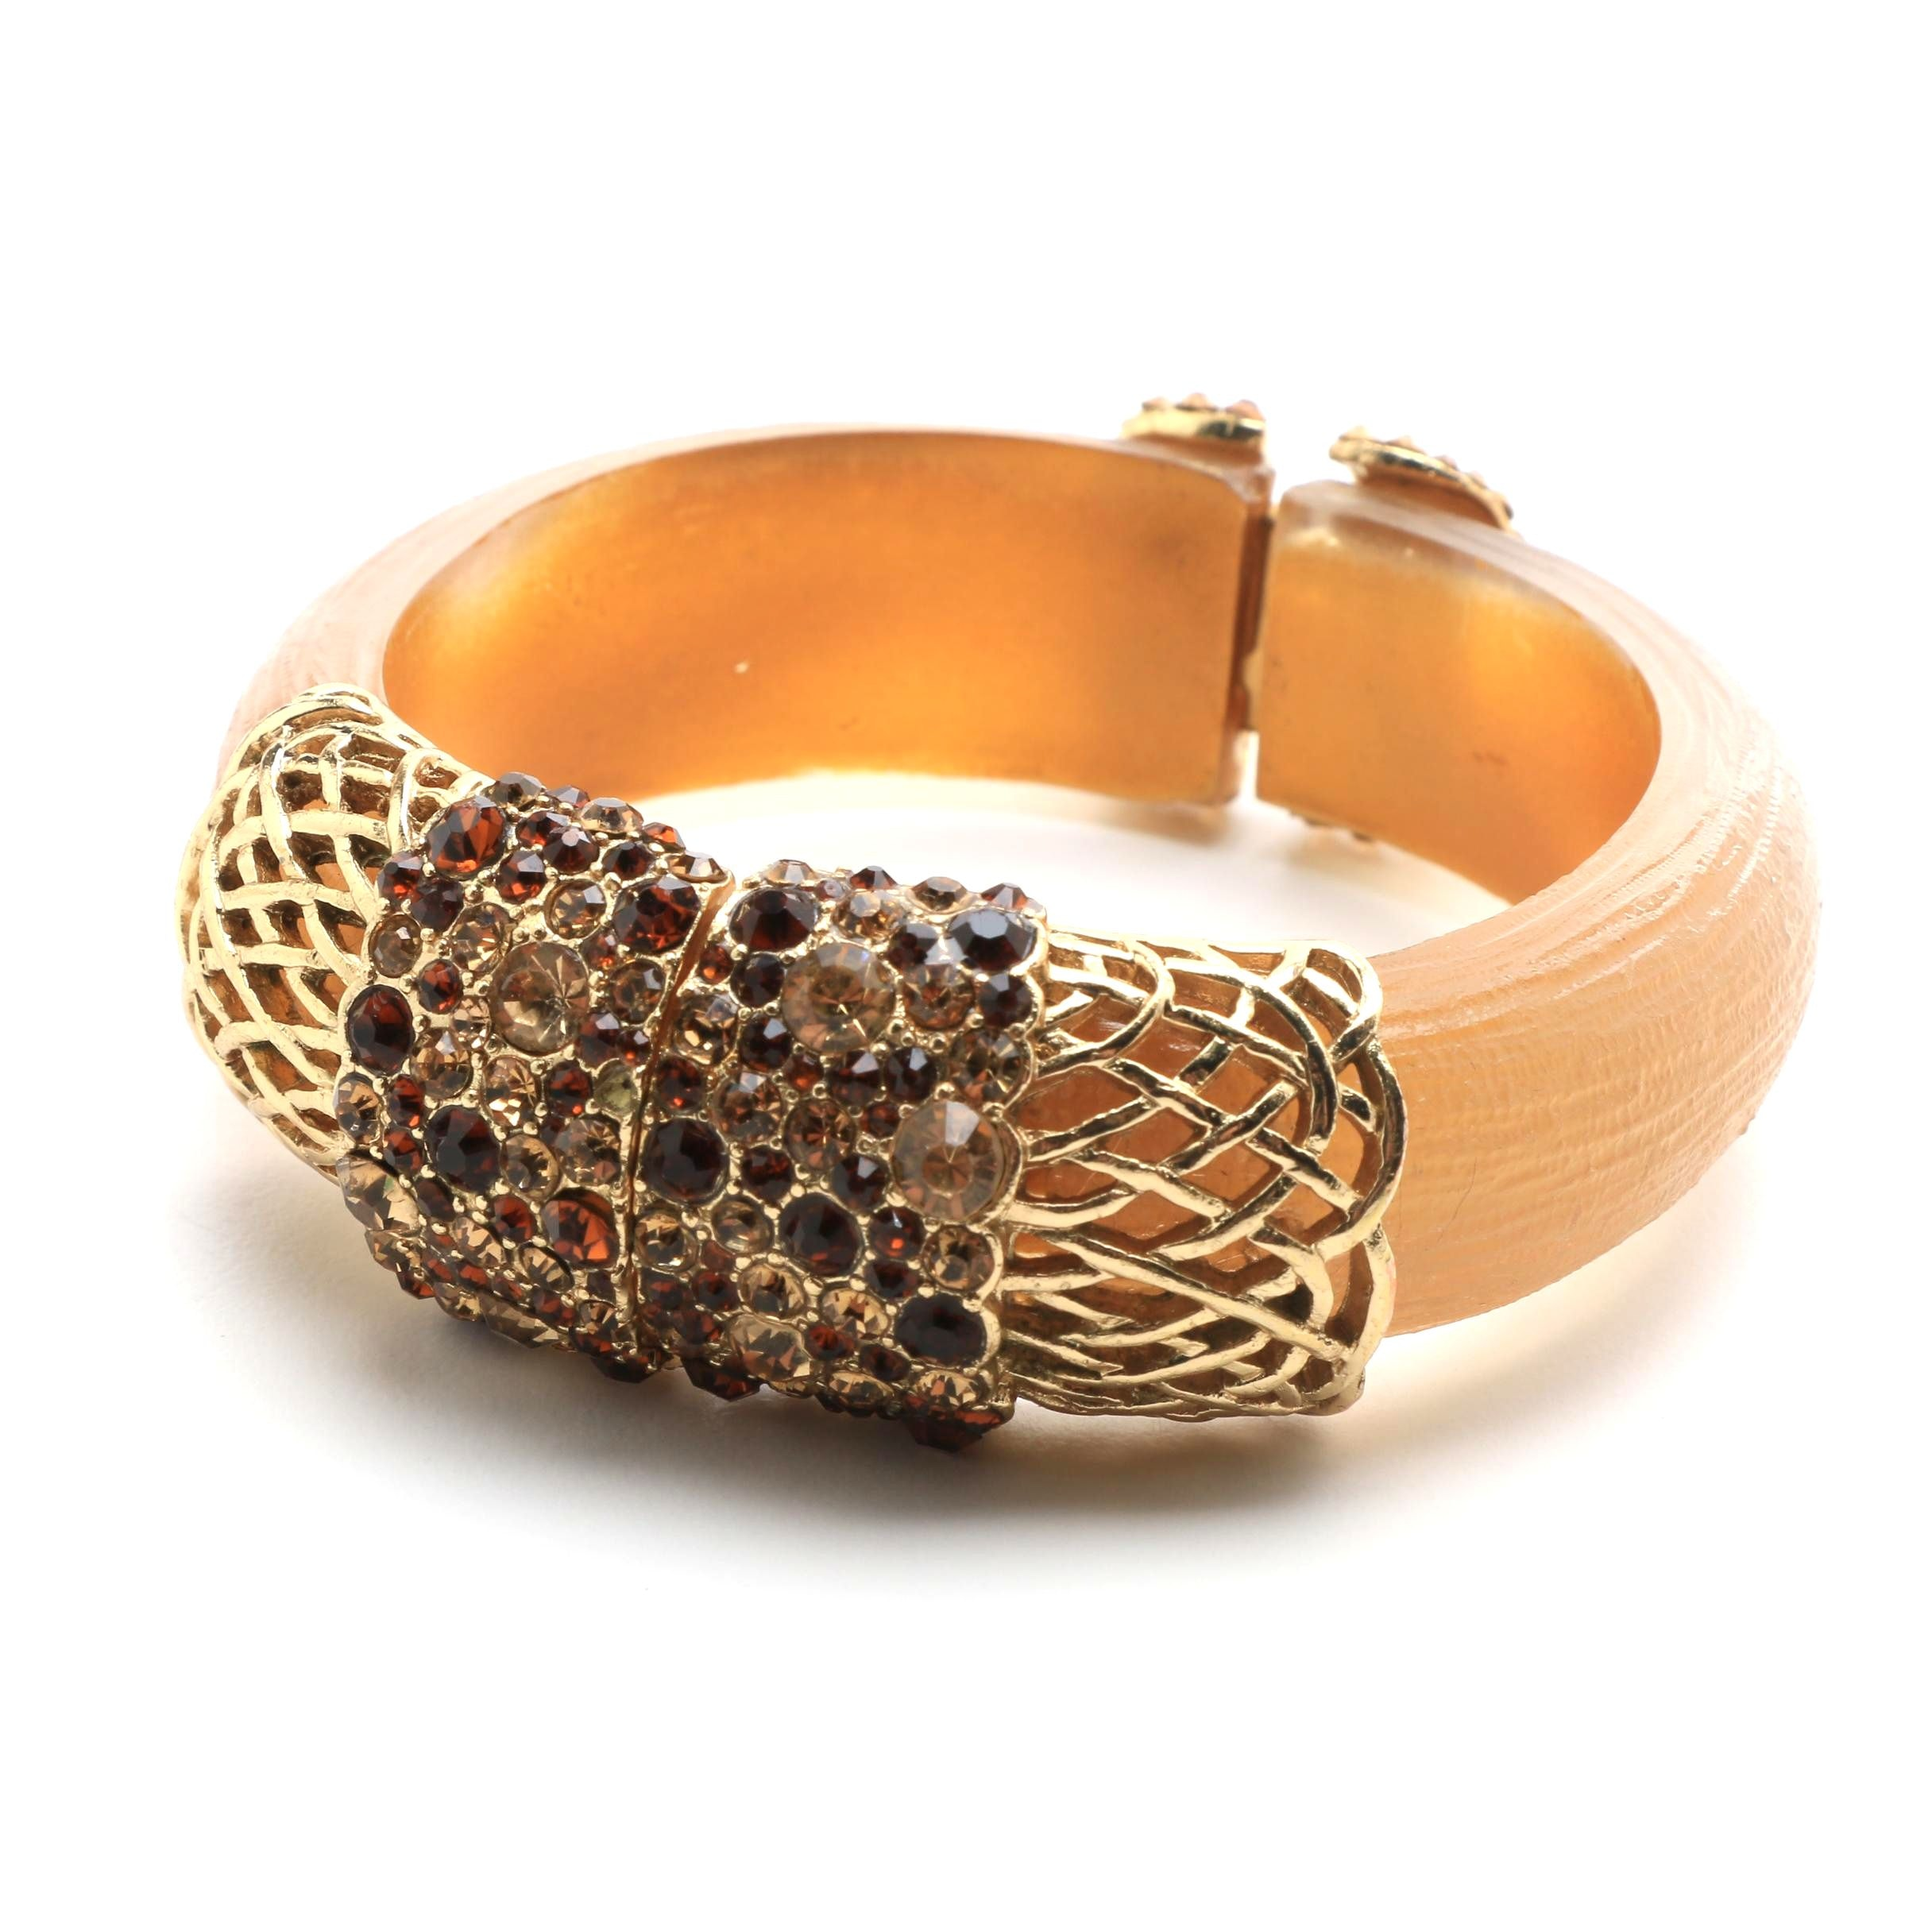 Jimmy Crystal Boutique Swarovski Acrylic Hinged Bracelet